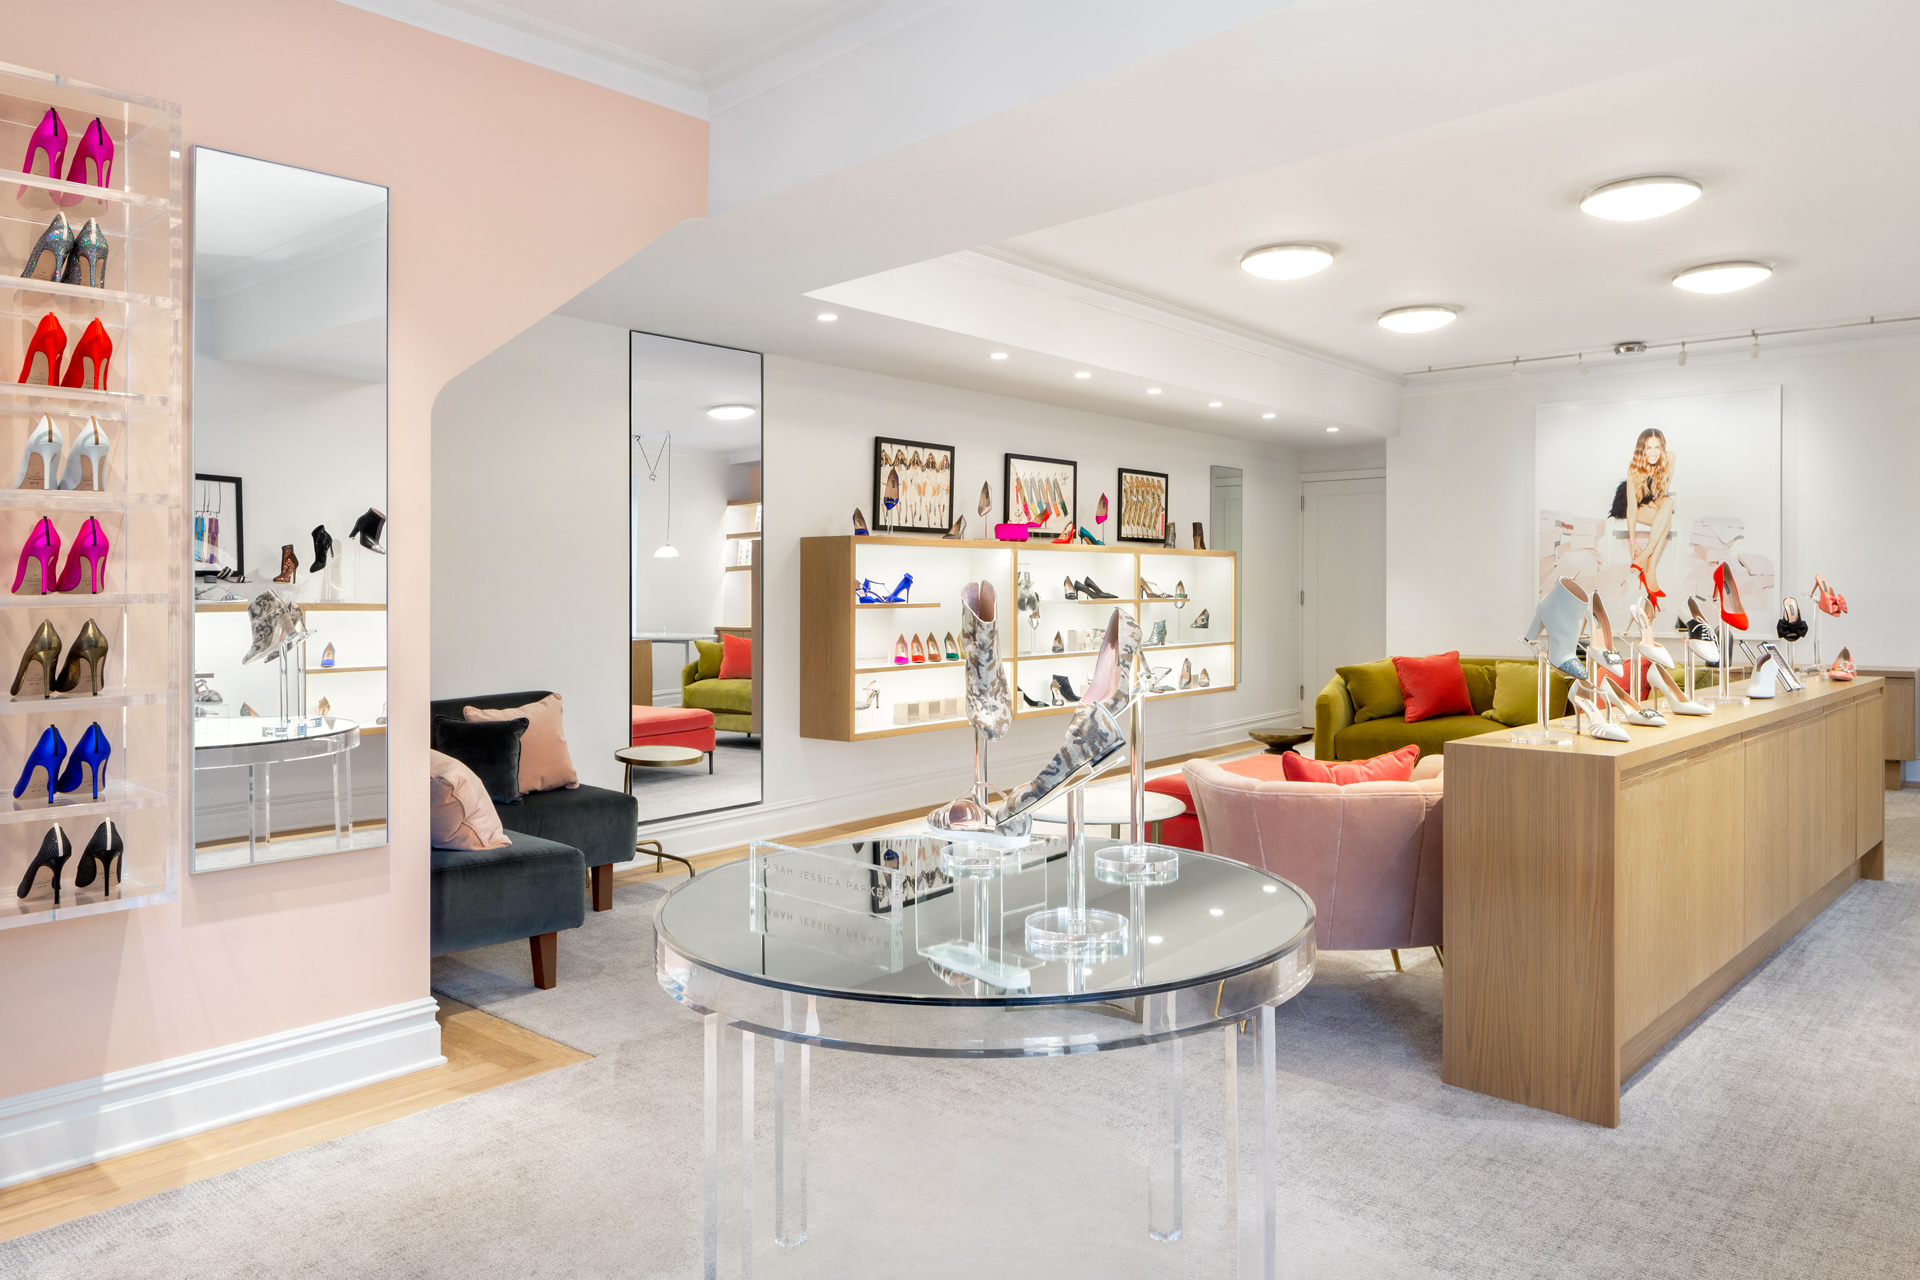 SJP by Sarah Jessica Parker retails store design